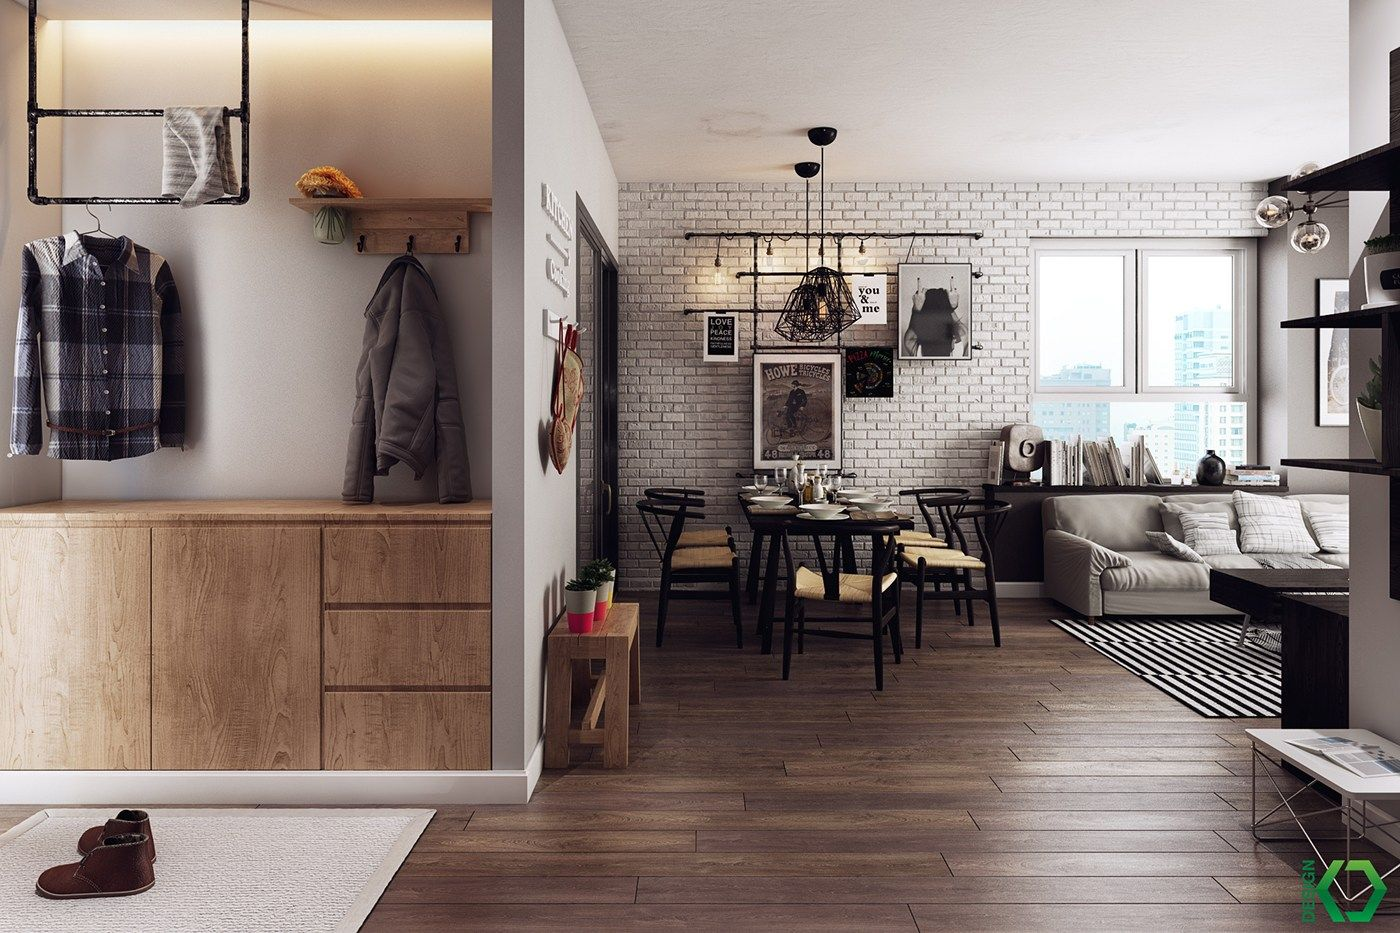 A Charming Nordic Apartment Interior Design by Koj Design